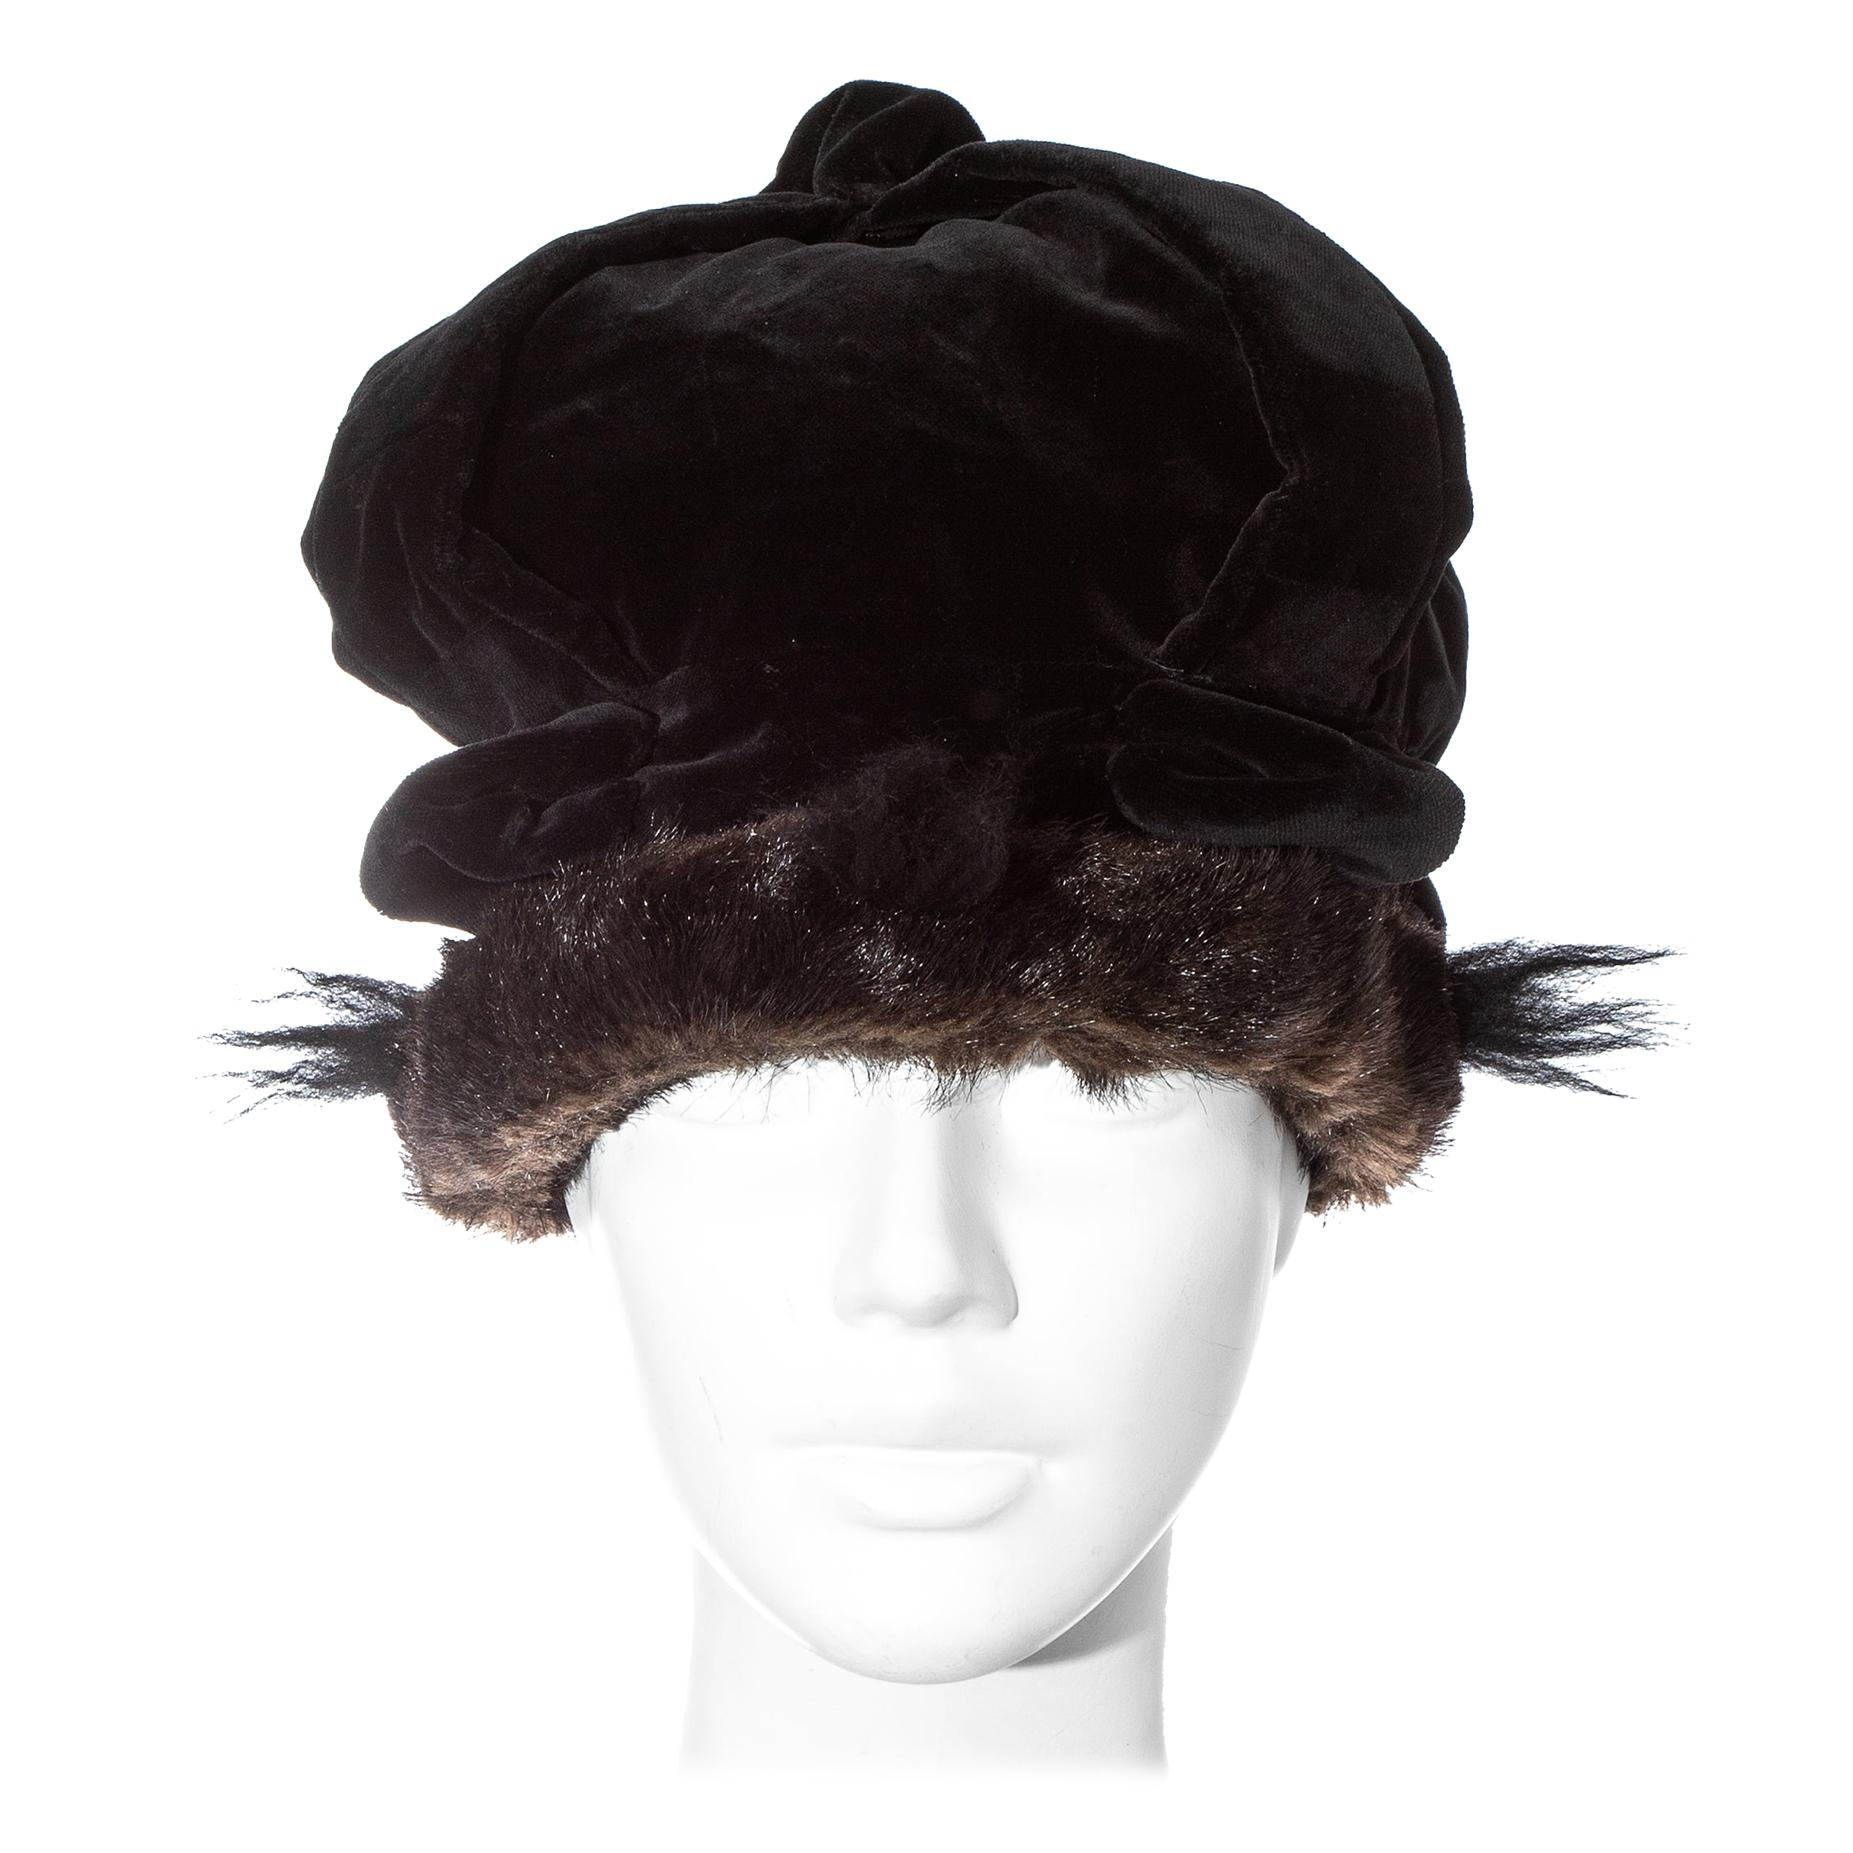 Vivienne Westwood black velvet and faux fur crown, fw 1987